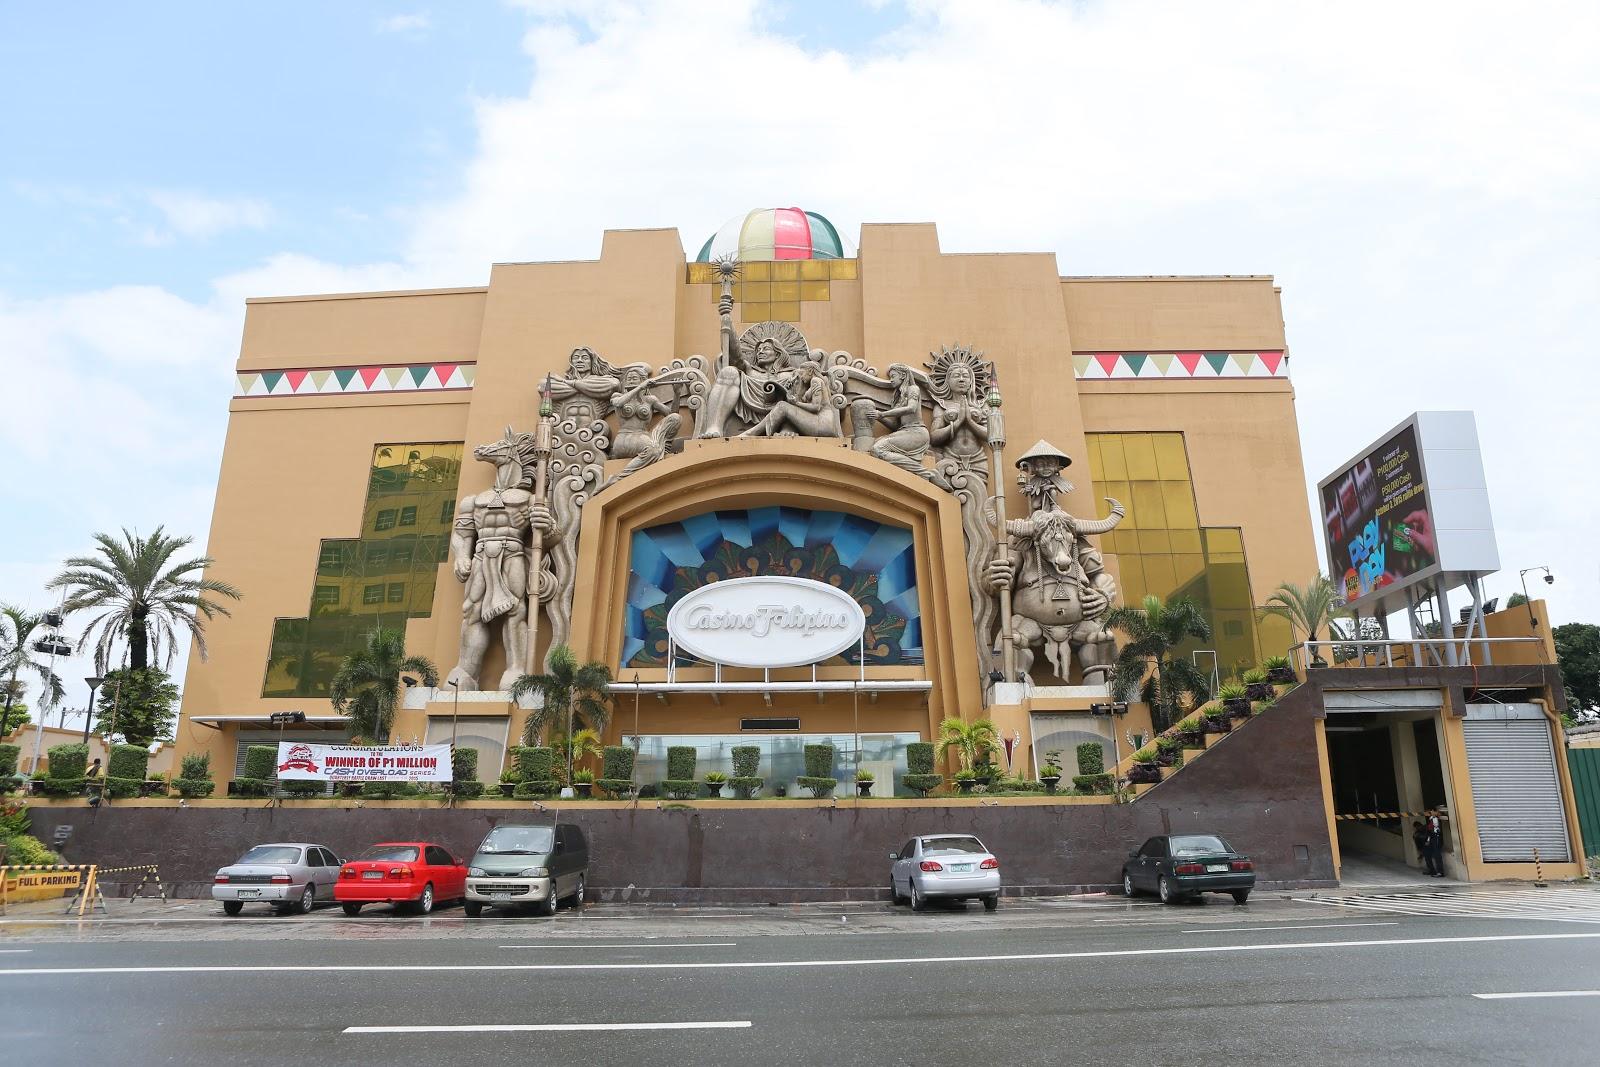 Oriental casino guiguinto bulacan vnh poker cheat